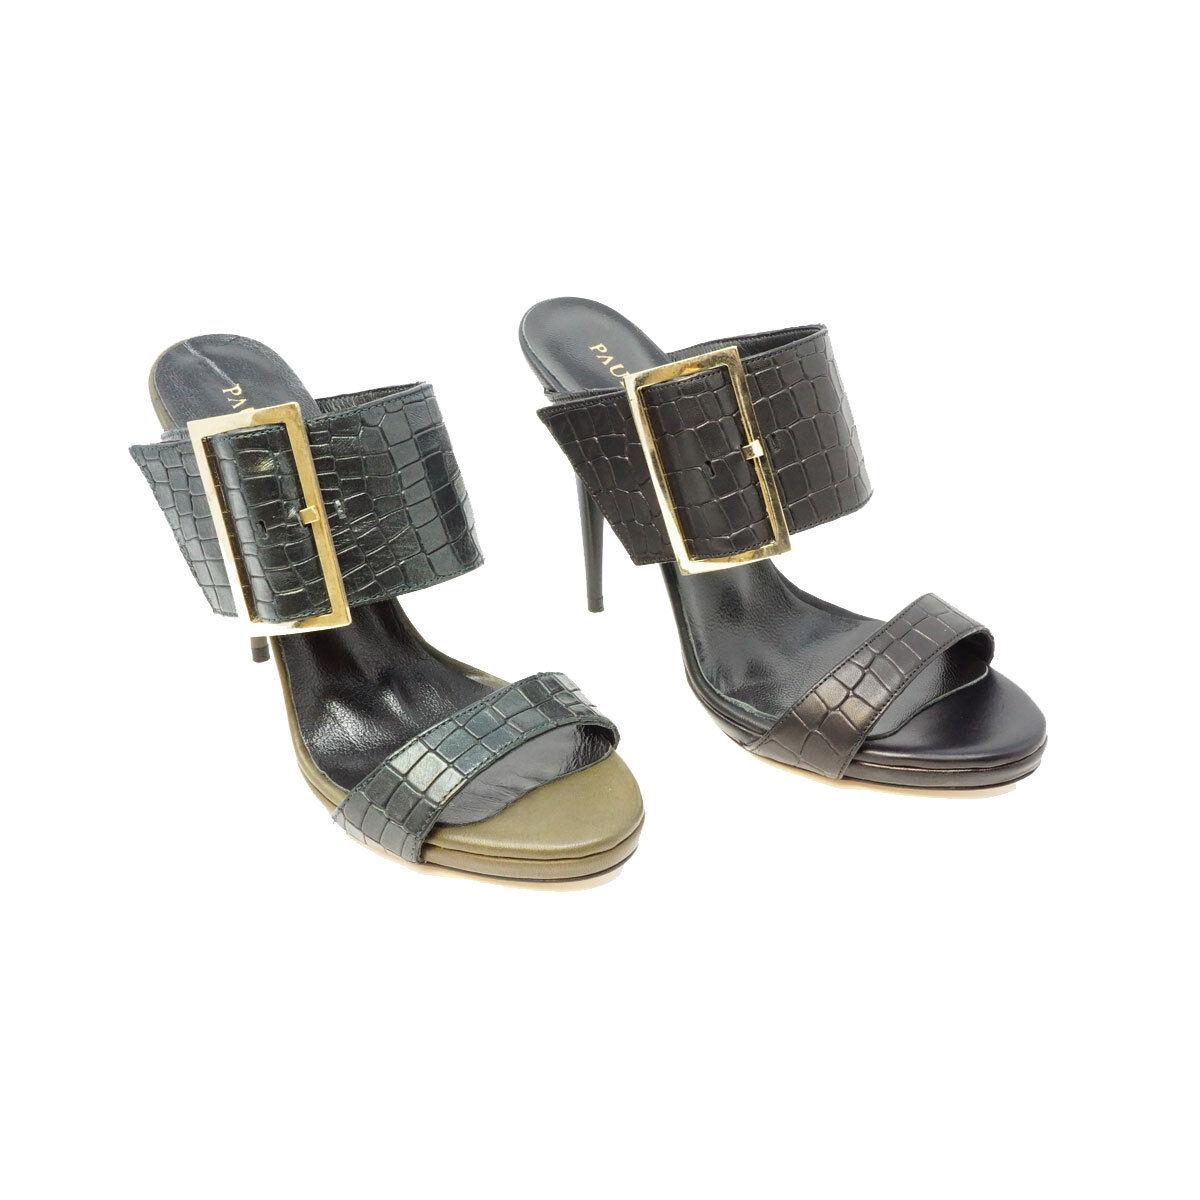 fino al 65% di sconto Futoli Artisan Artisan Artisan Unique Sandals Fashion Handmade donna scarpe Genuine Leather  vendita online